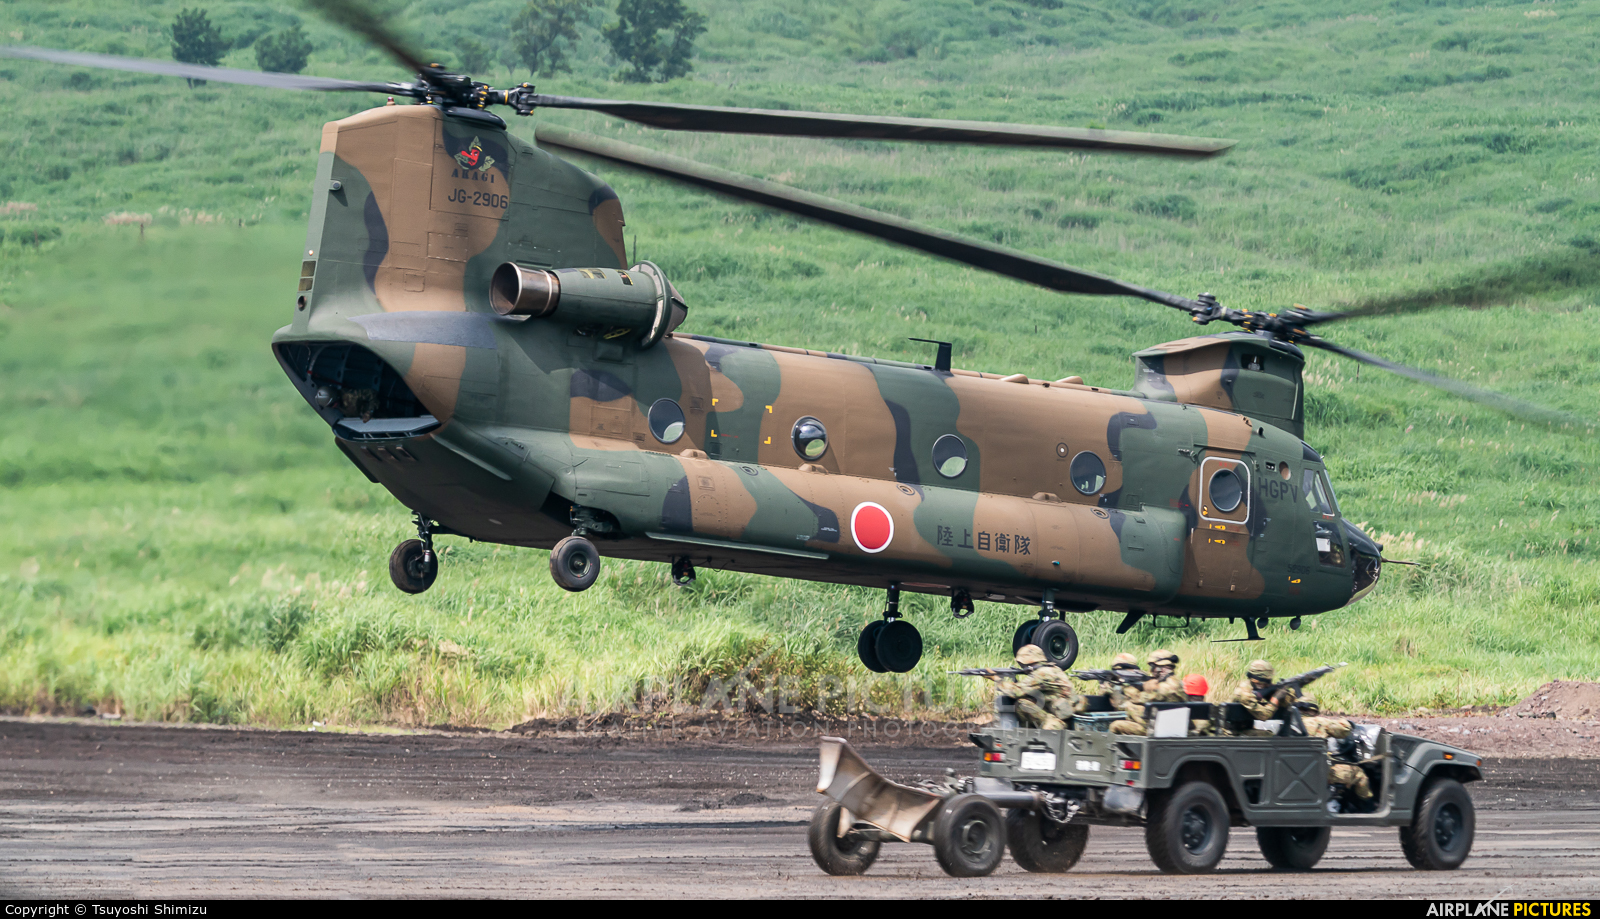 Japan - Ground Self Defense Force 52906 aircraft at Off Airport - Japan